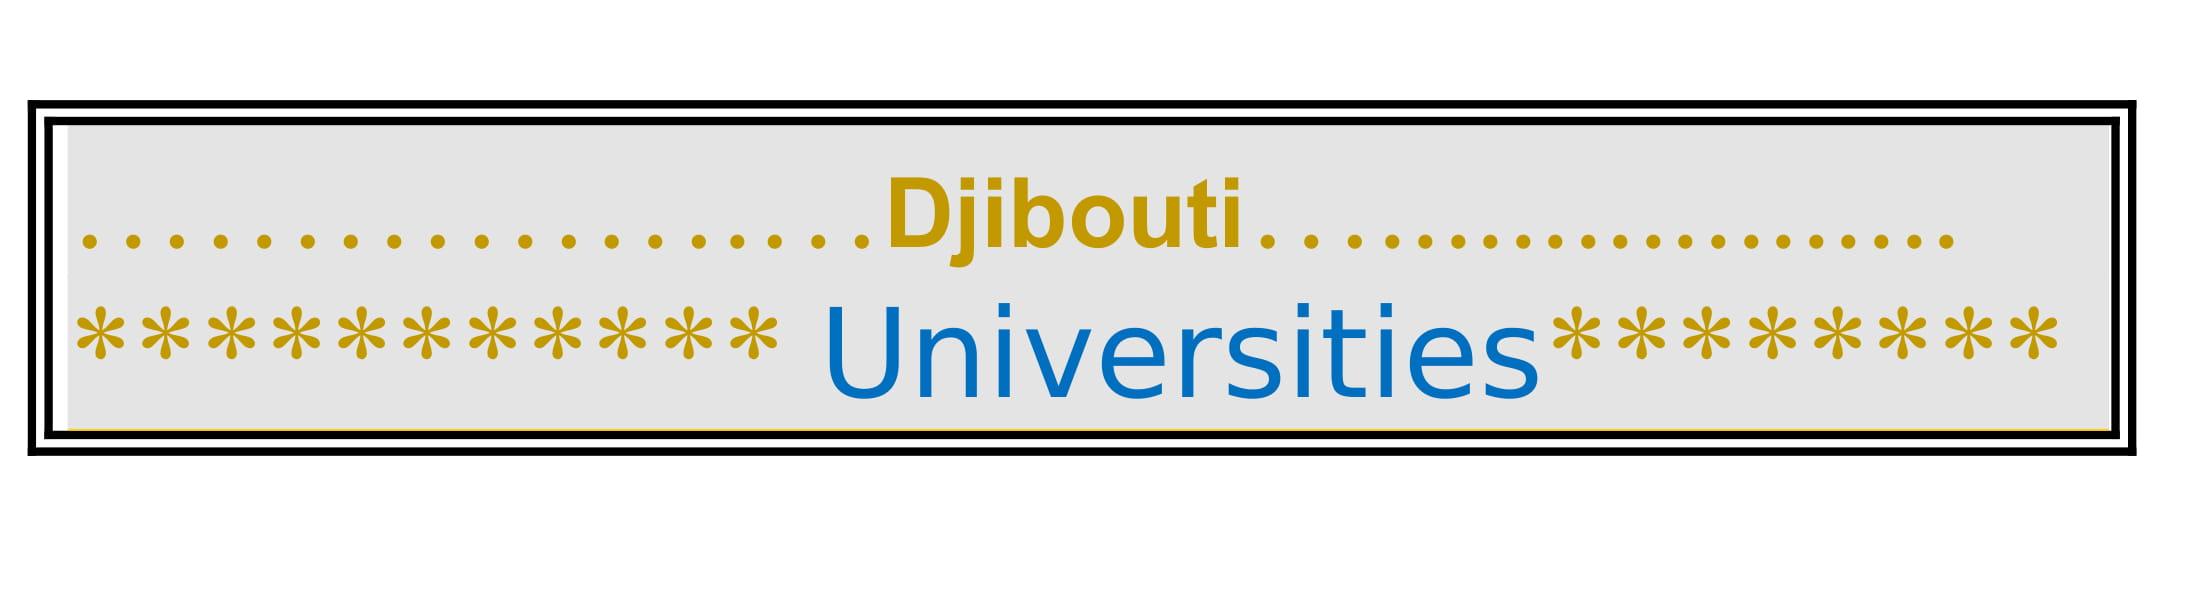 List of Universities in Djibouti